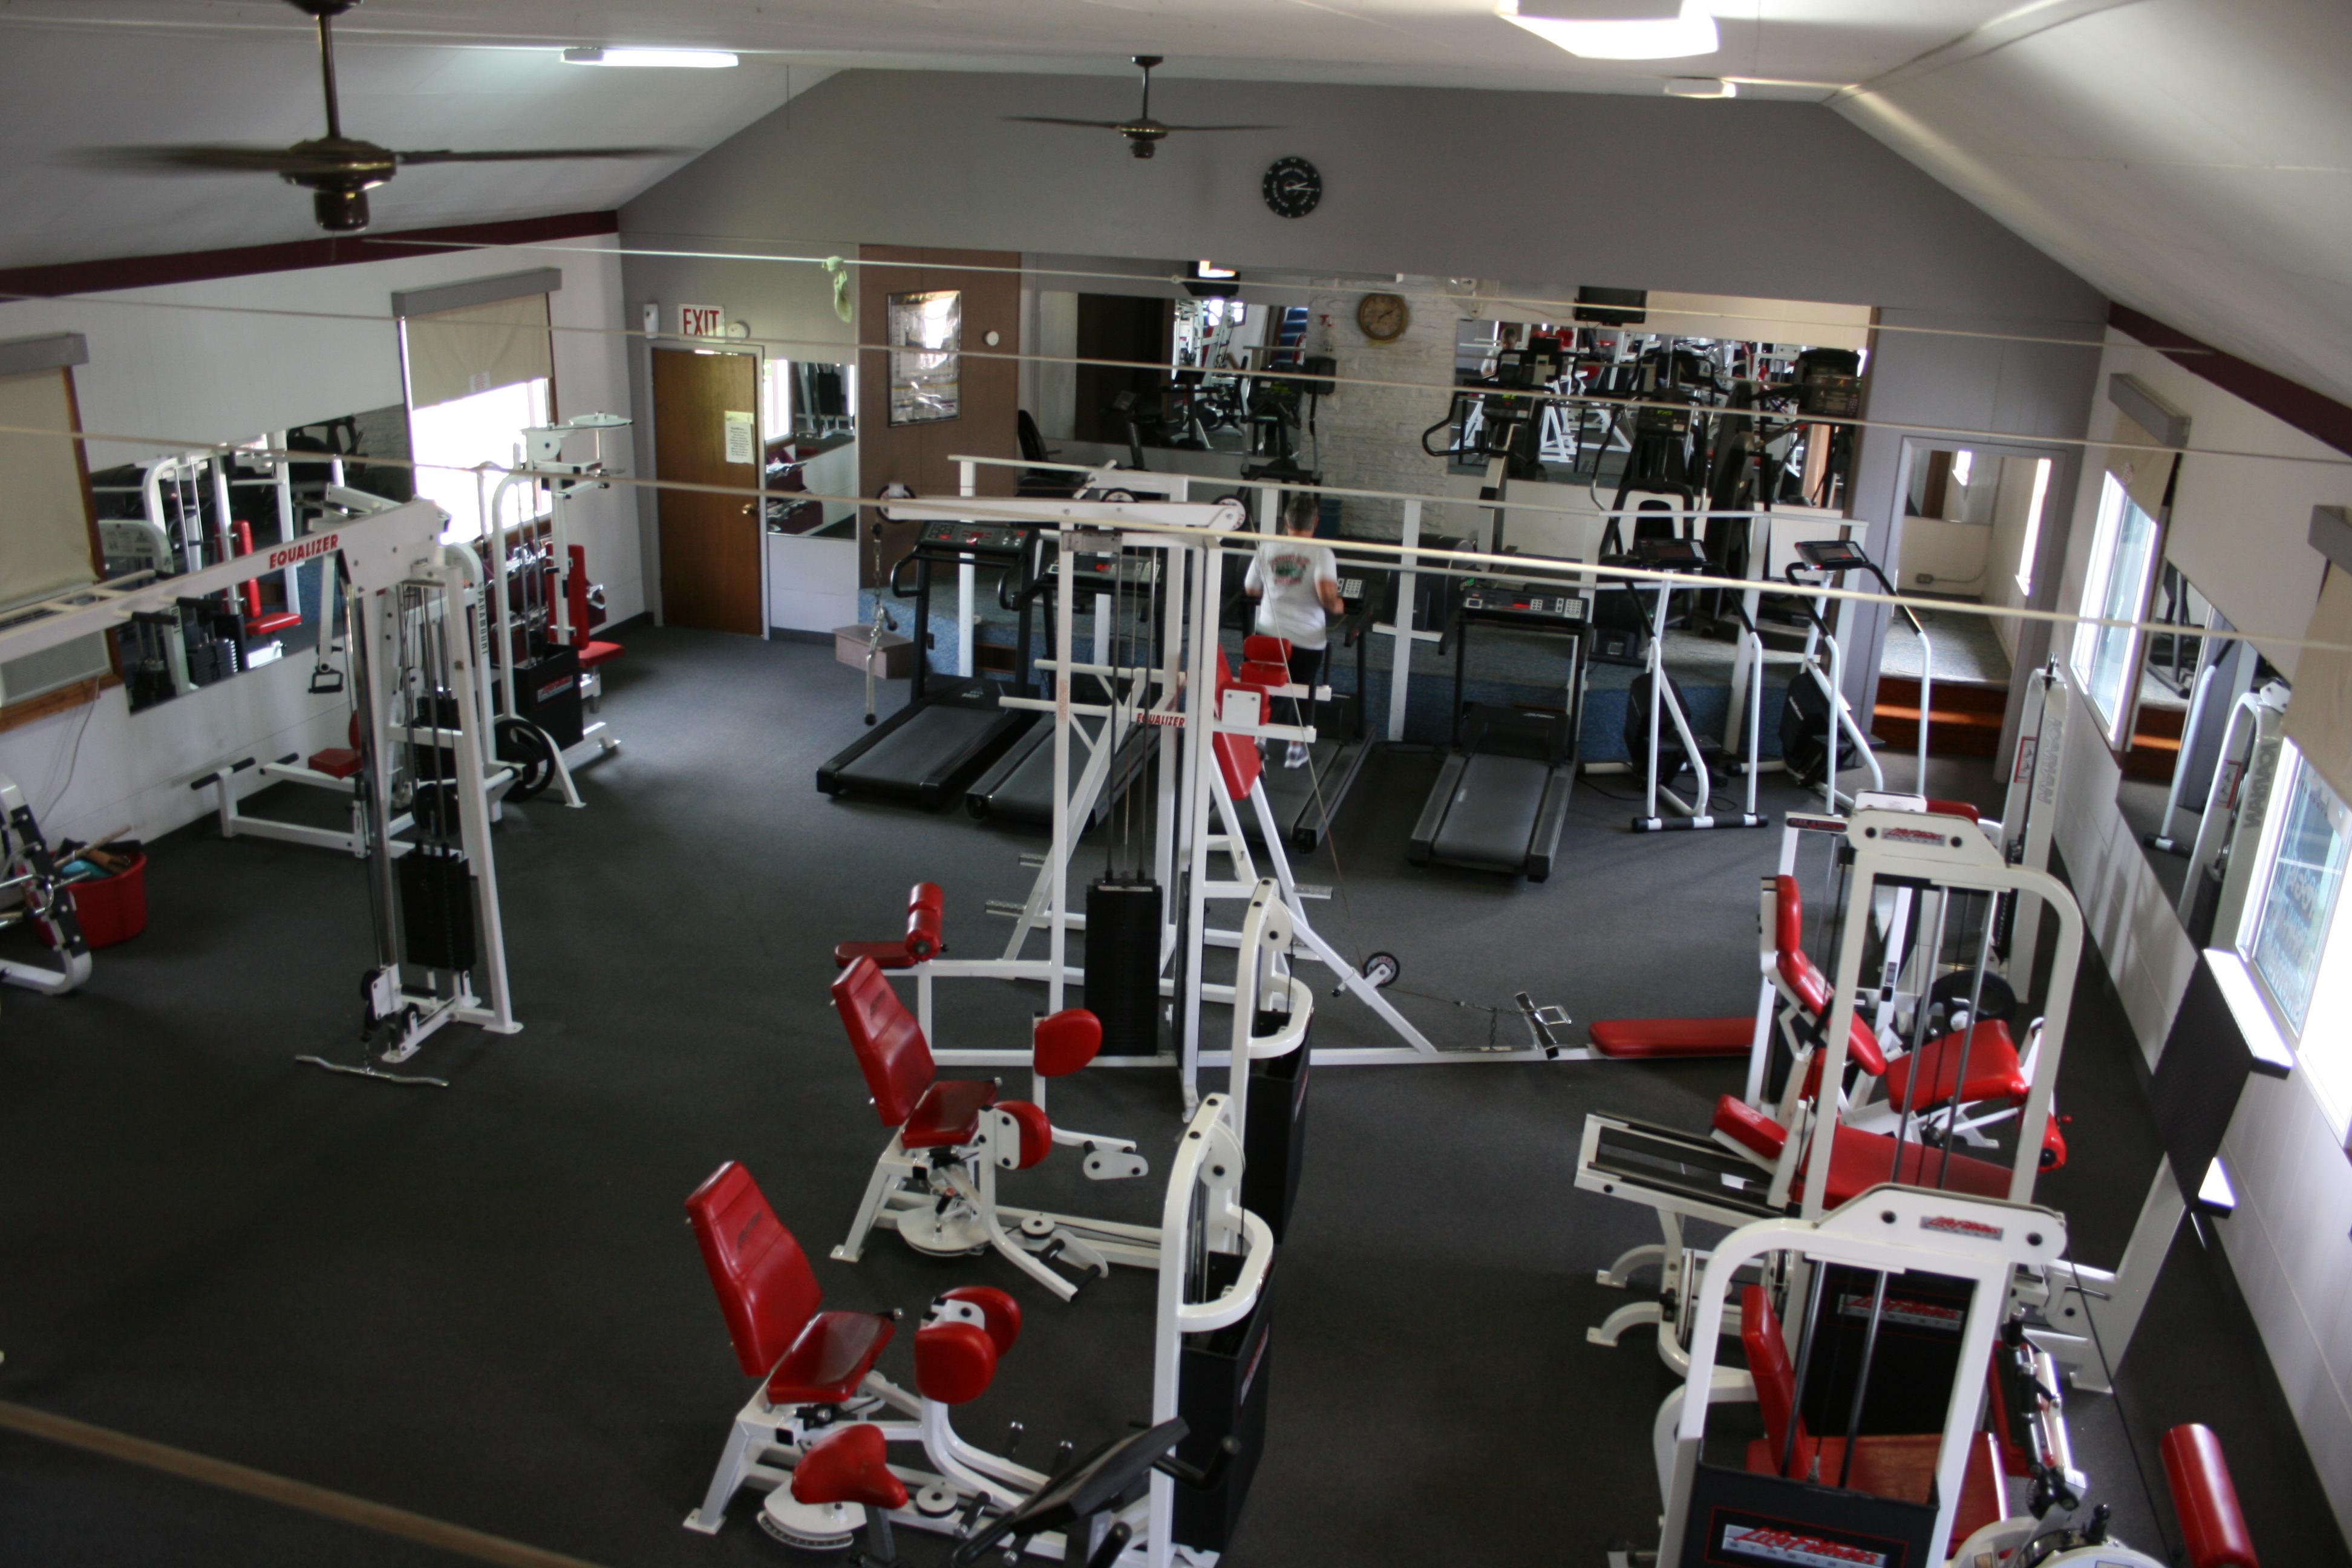 Upper gym facility